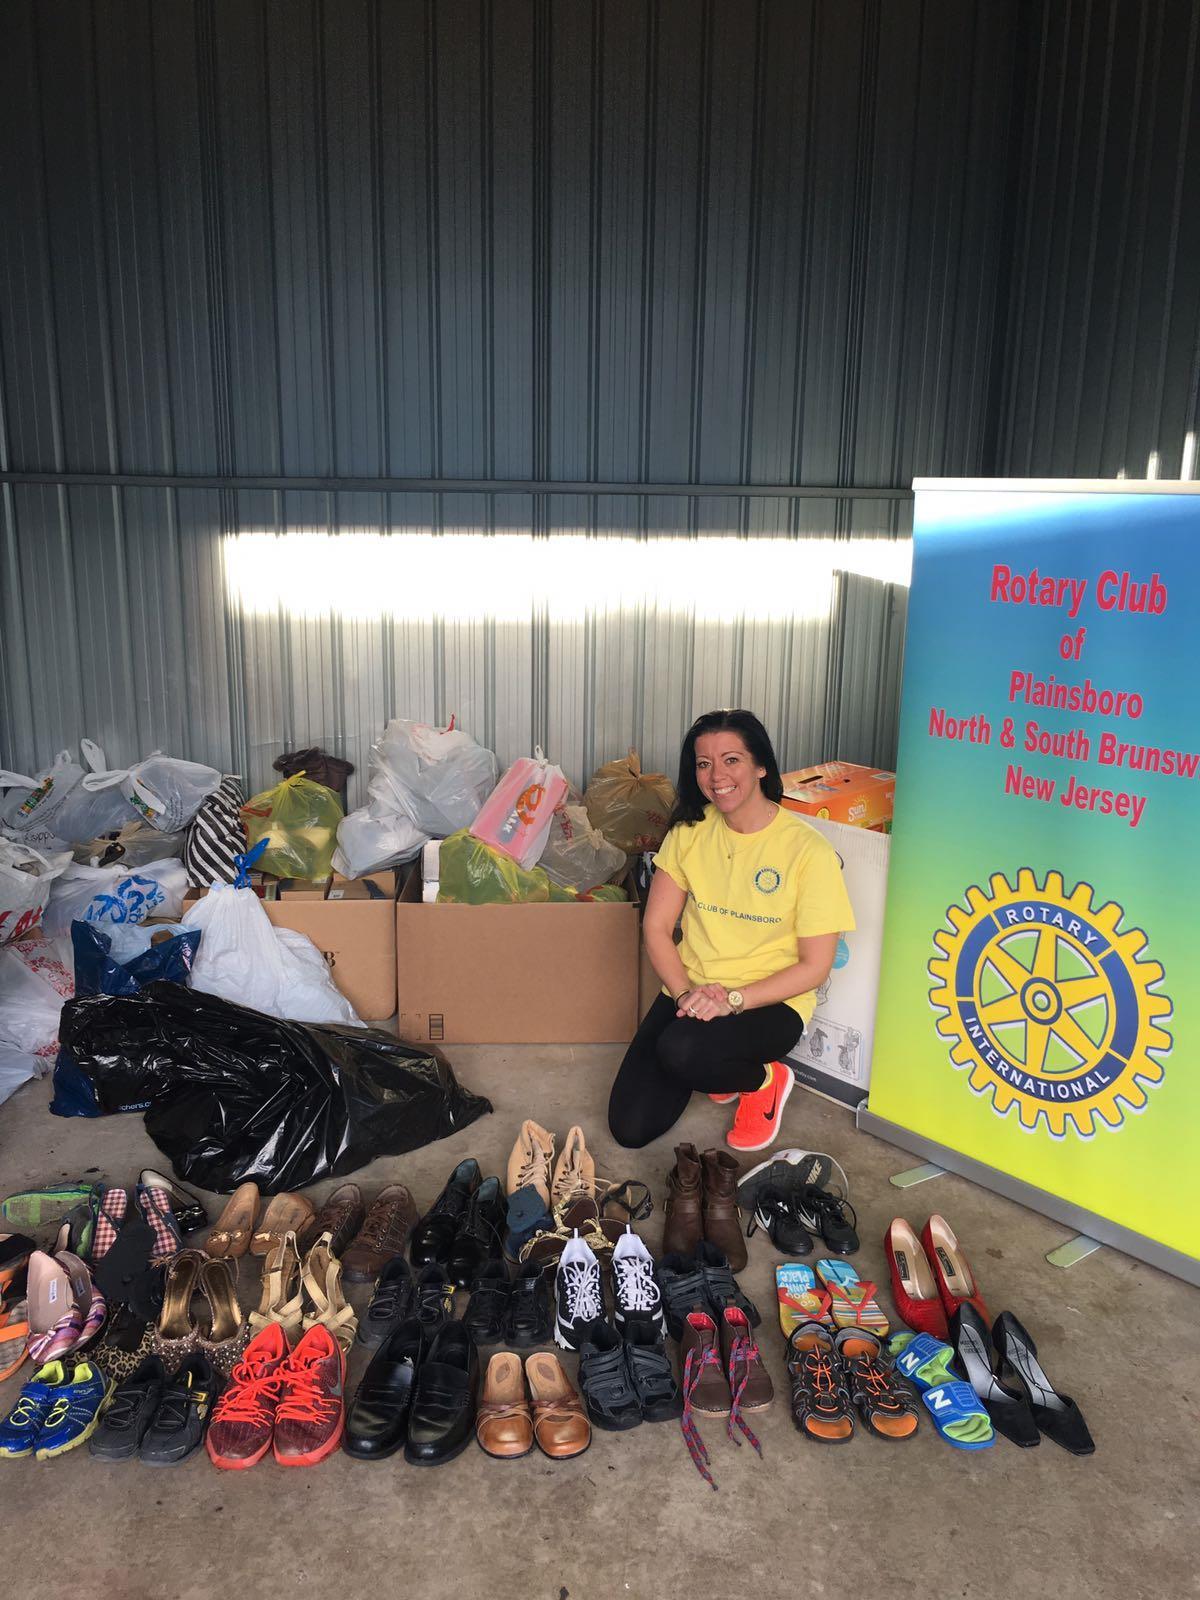 Stories | Rotary Club of Plainsboro